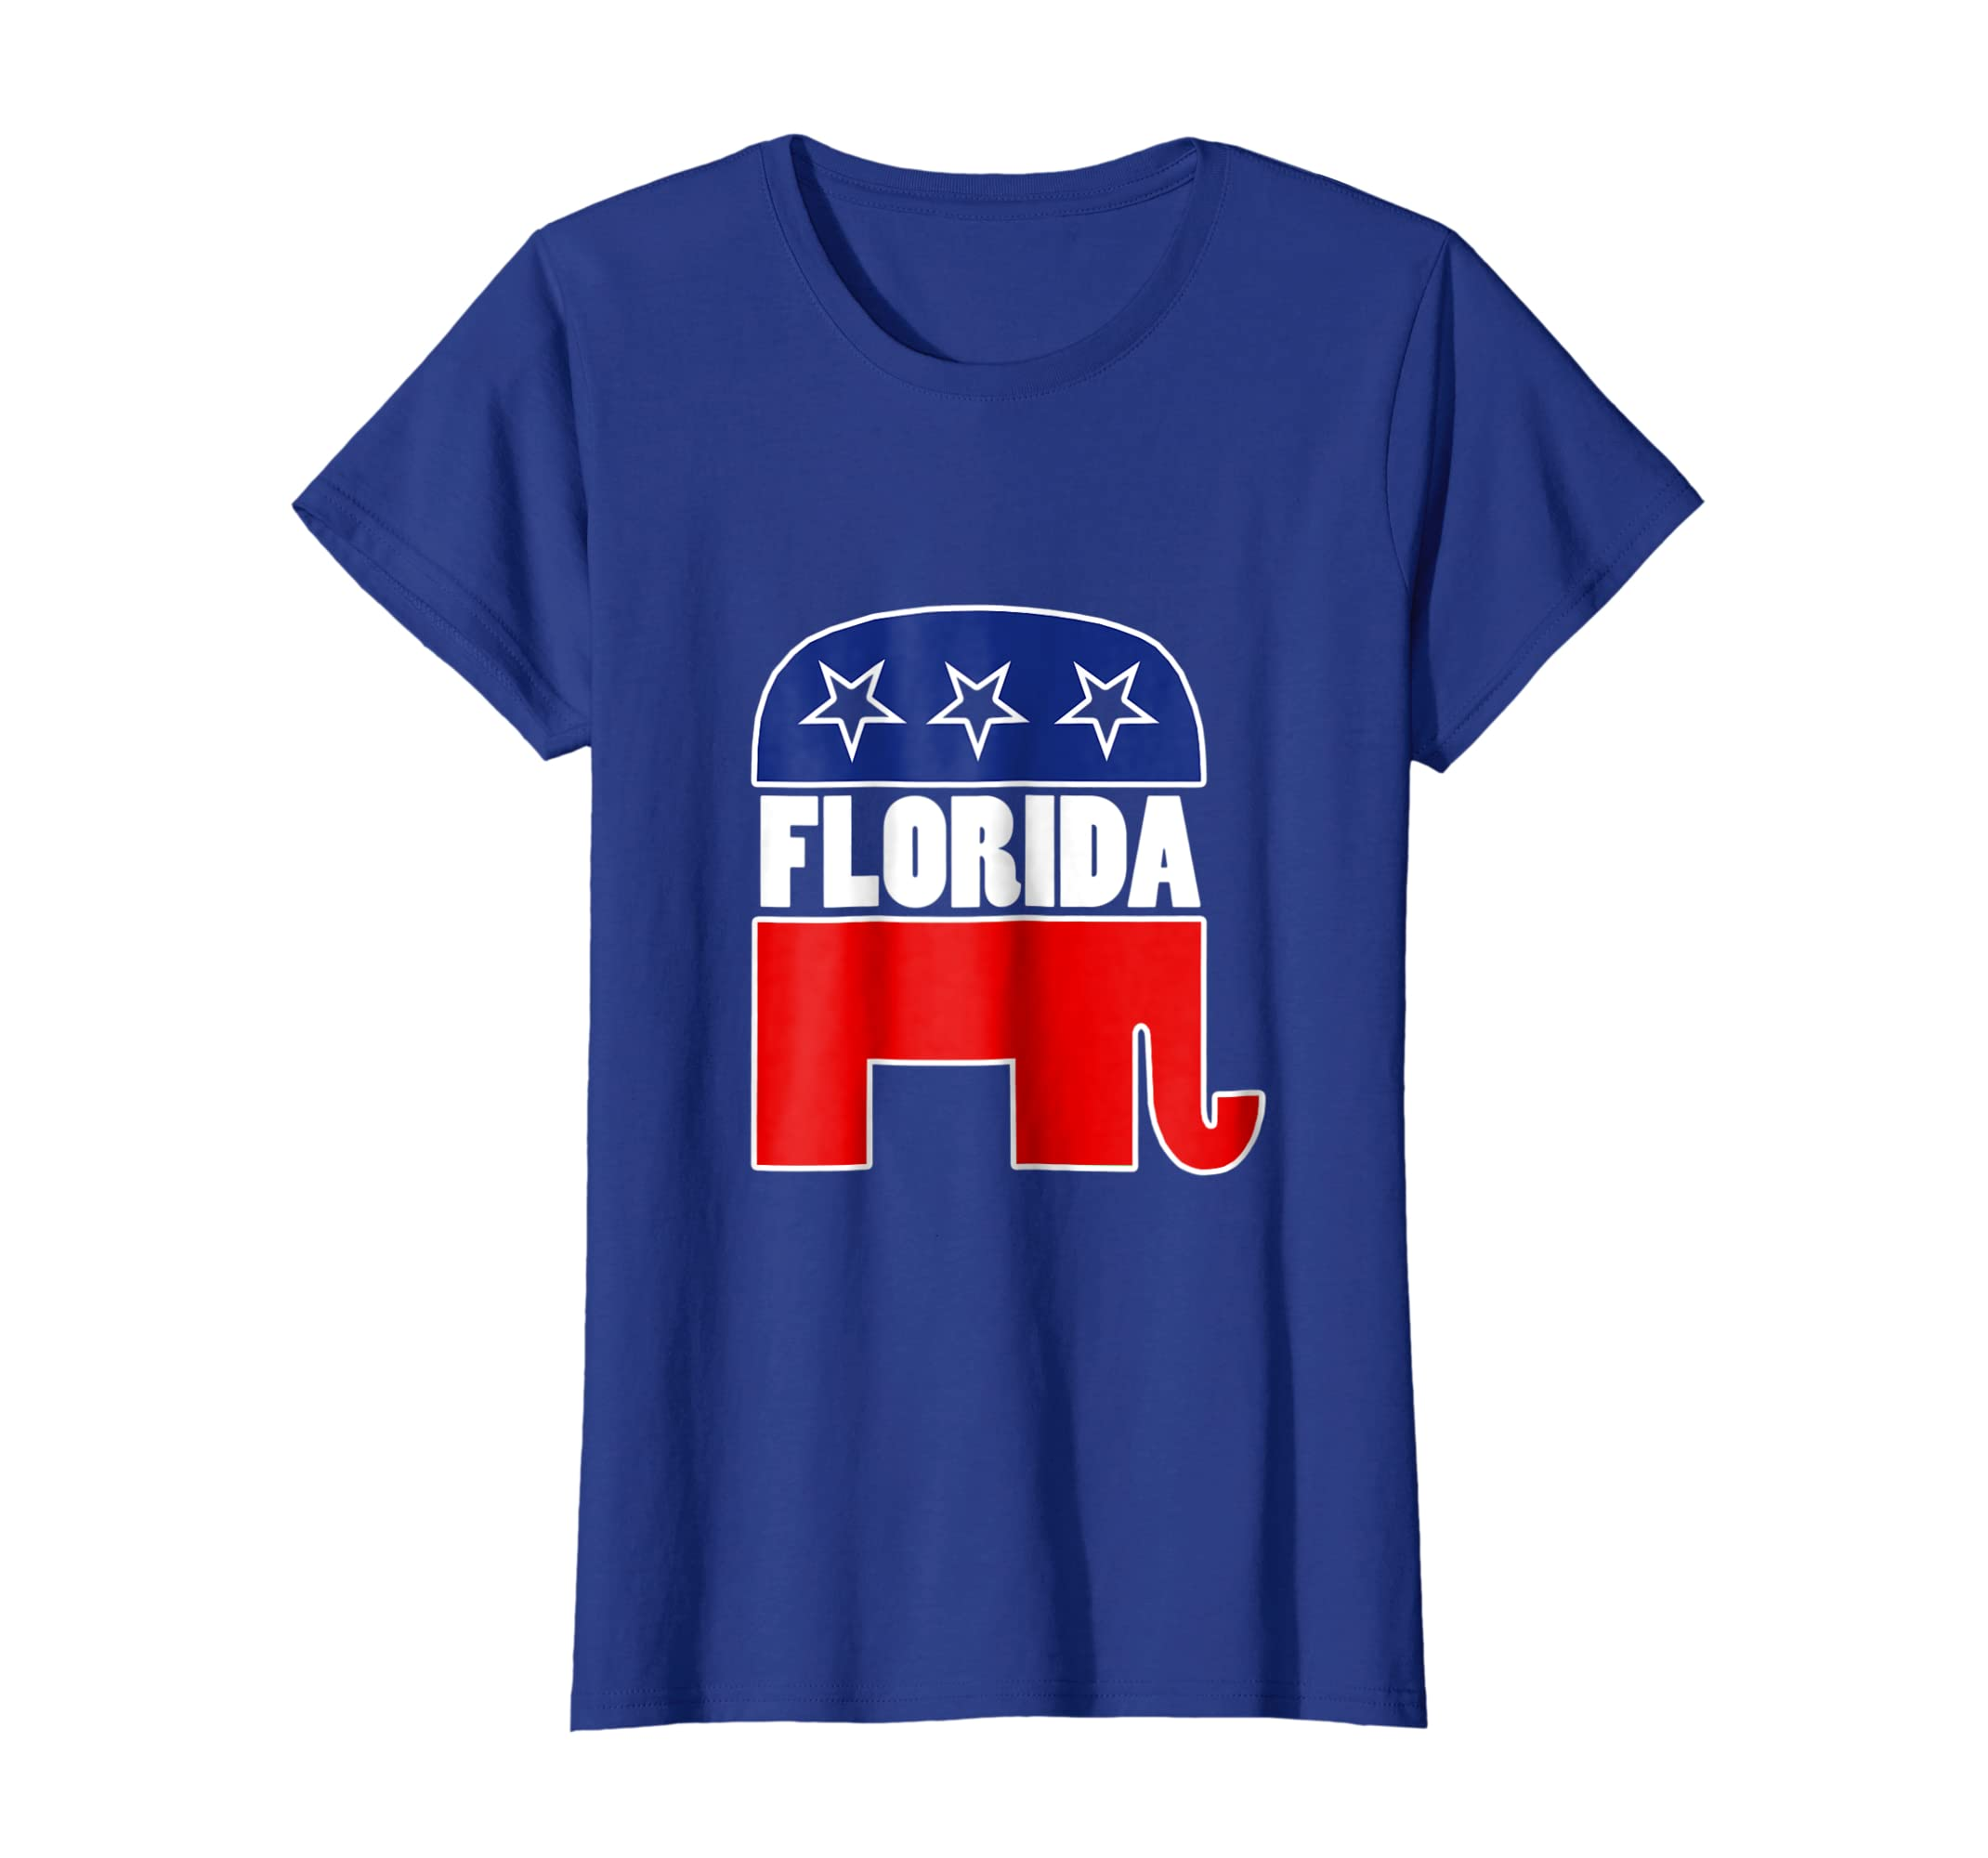 c0bb56904bbea9 Amazon.com  Florida republican shirt GOP elephant logo tshirt  Clothing